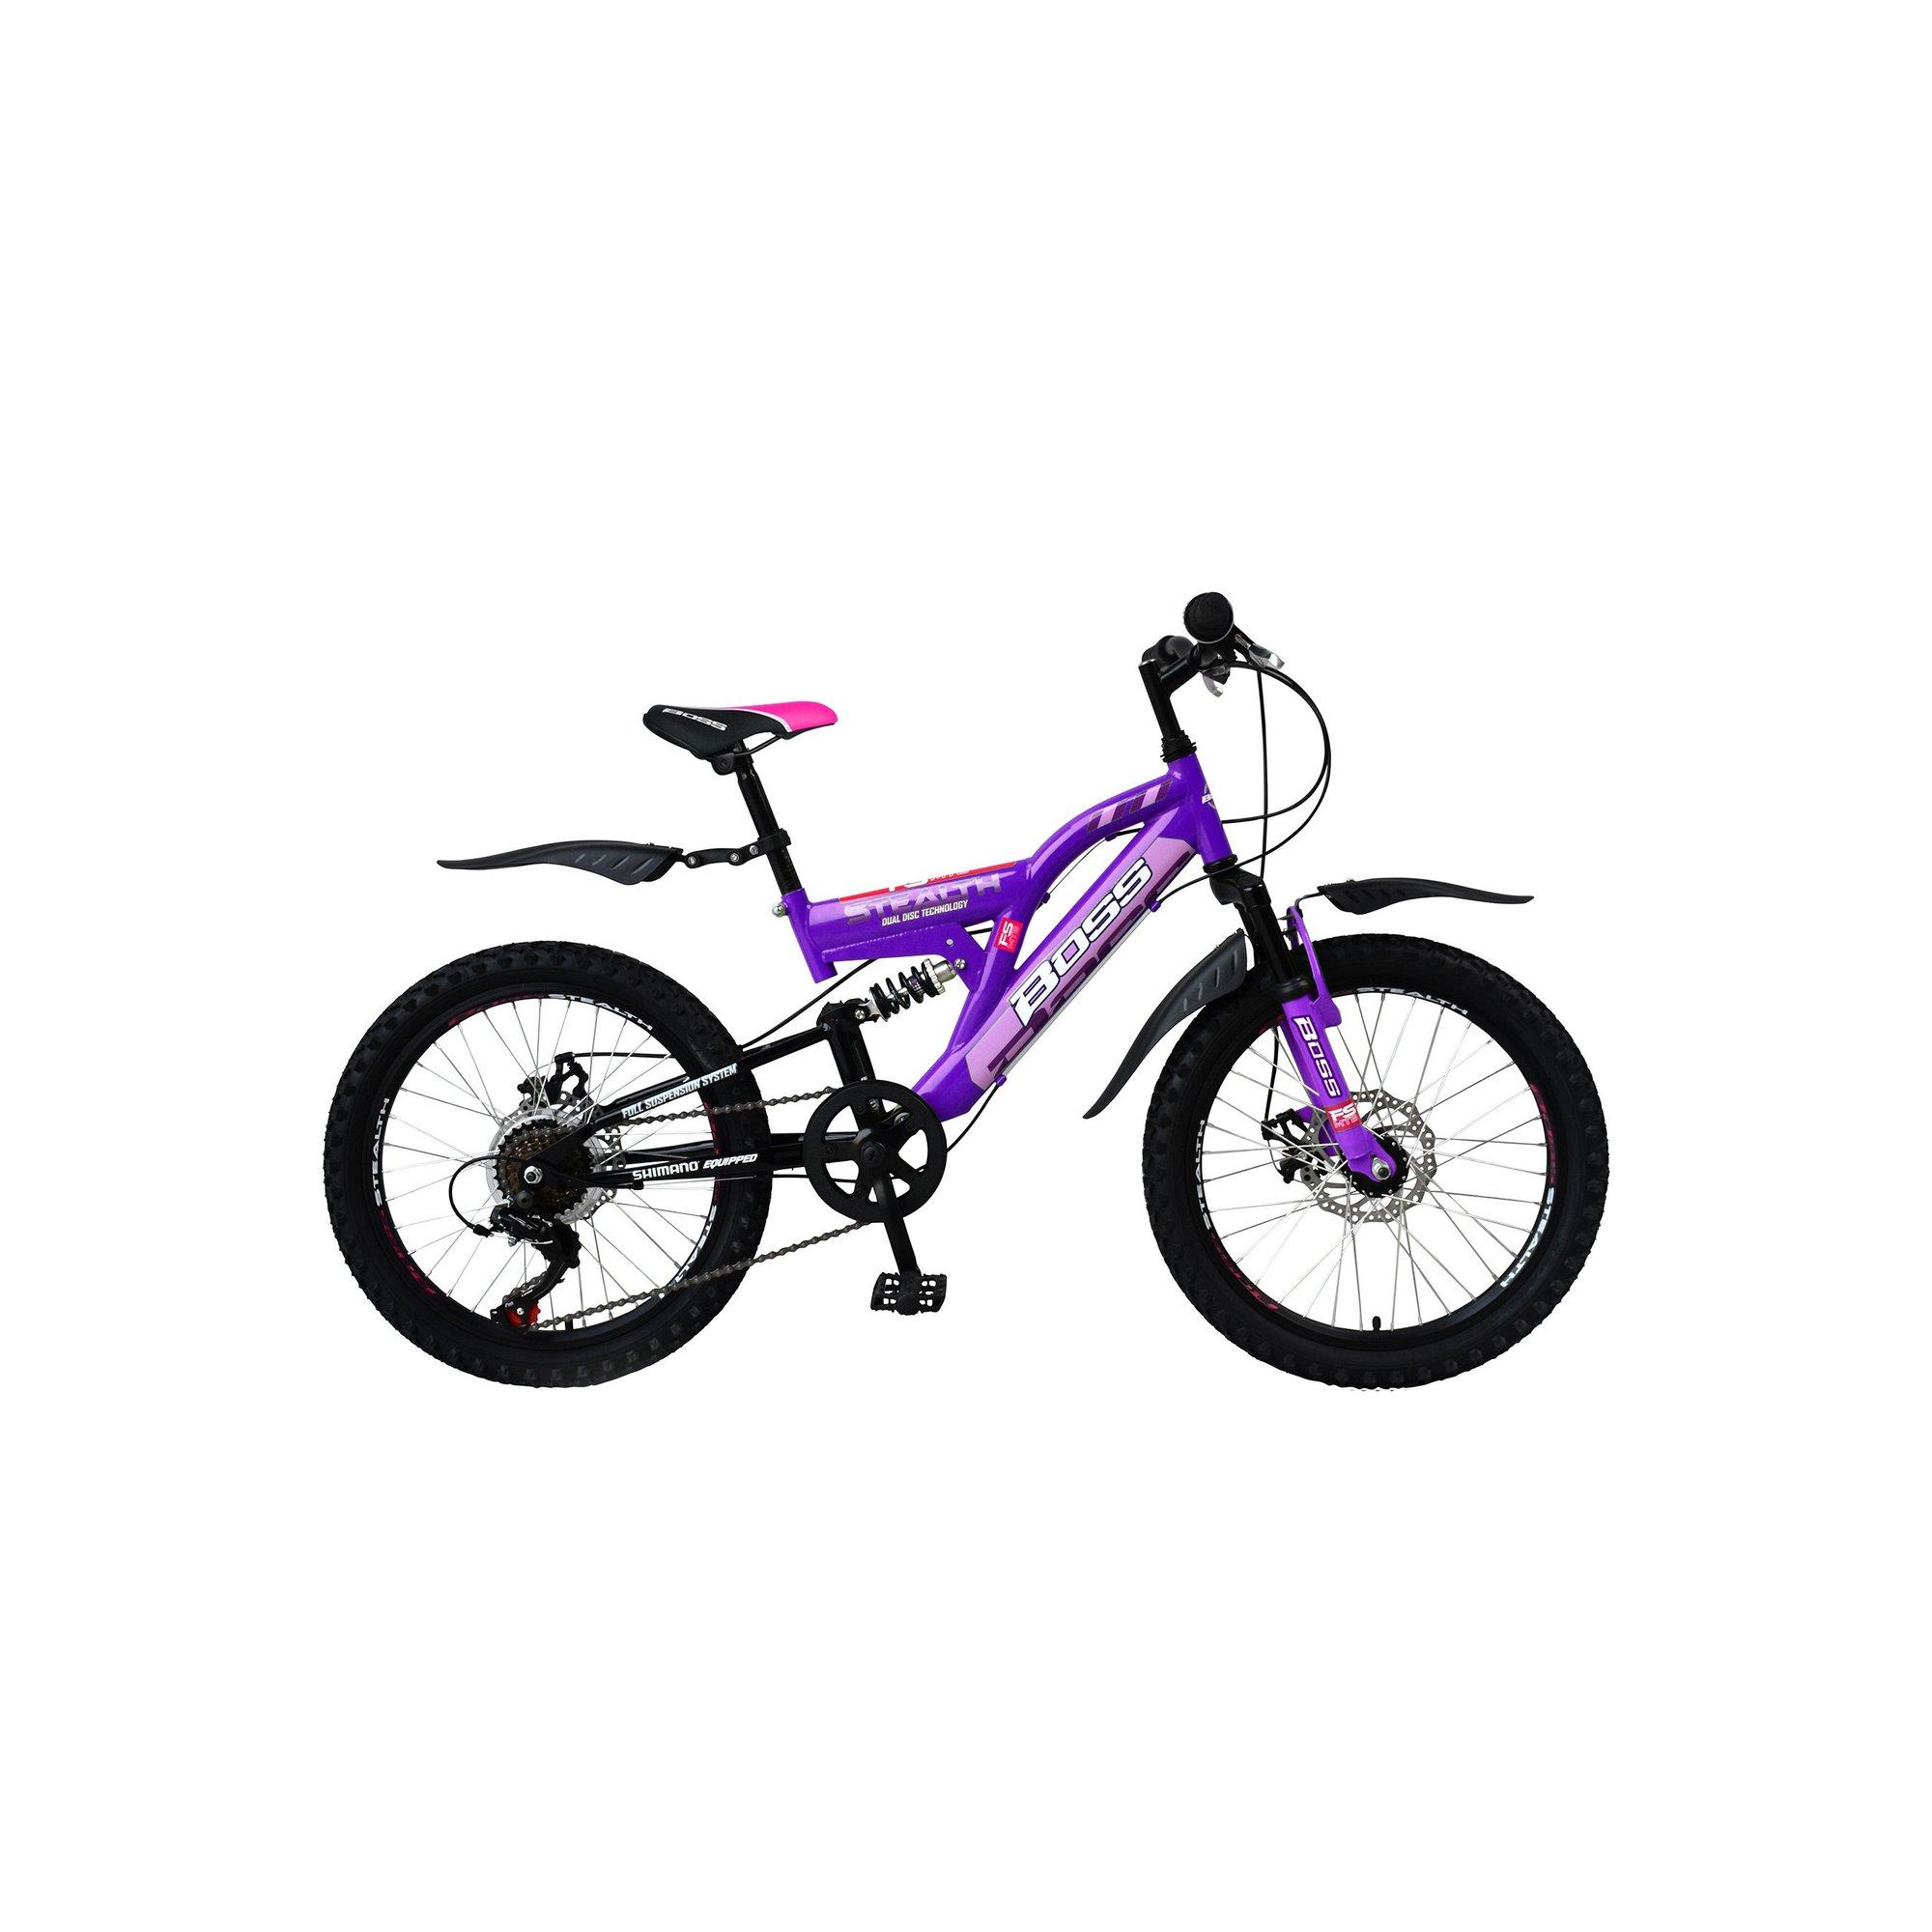 Image of Boss Stealth 20 Inch Purple Mountain Bike